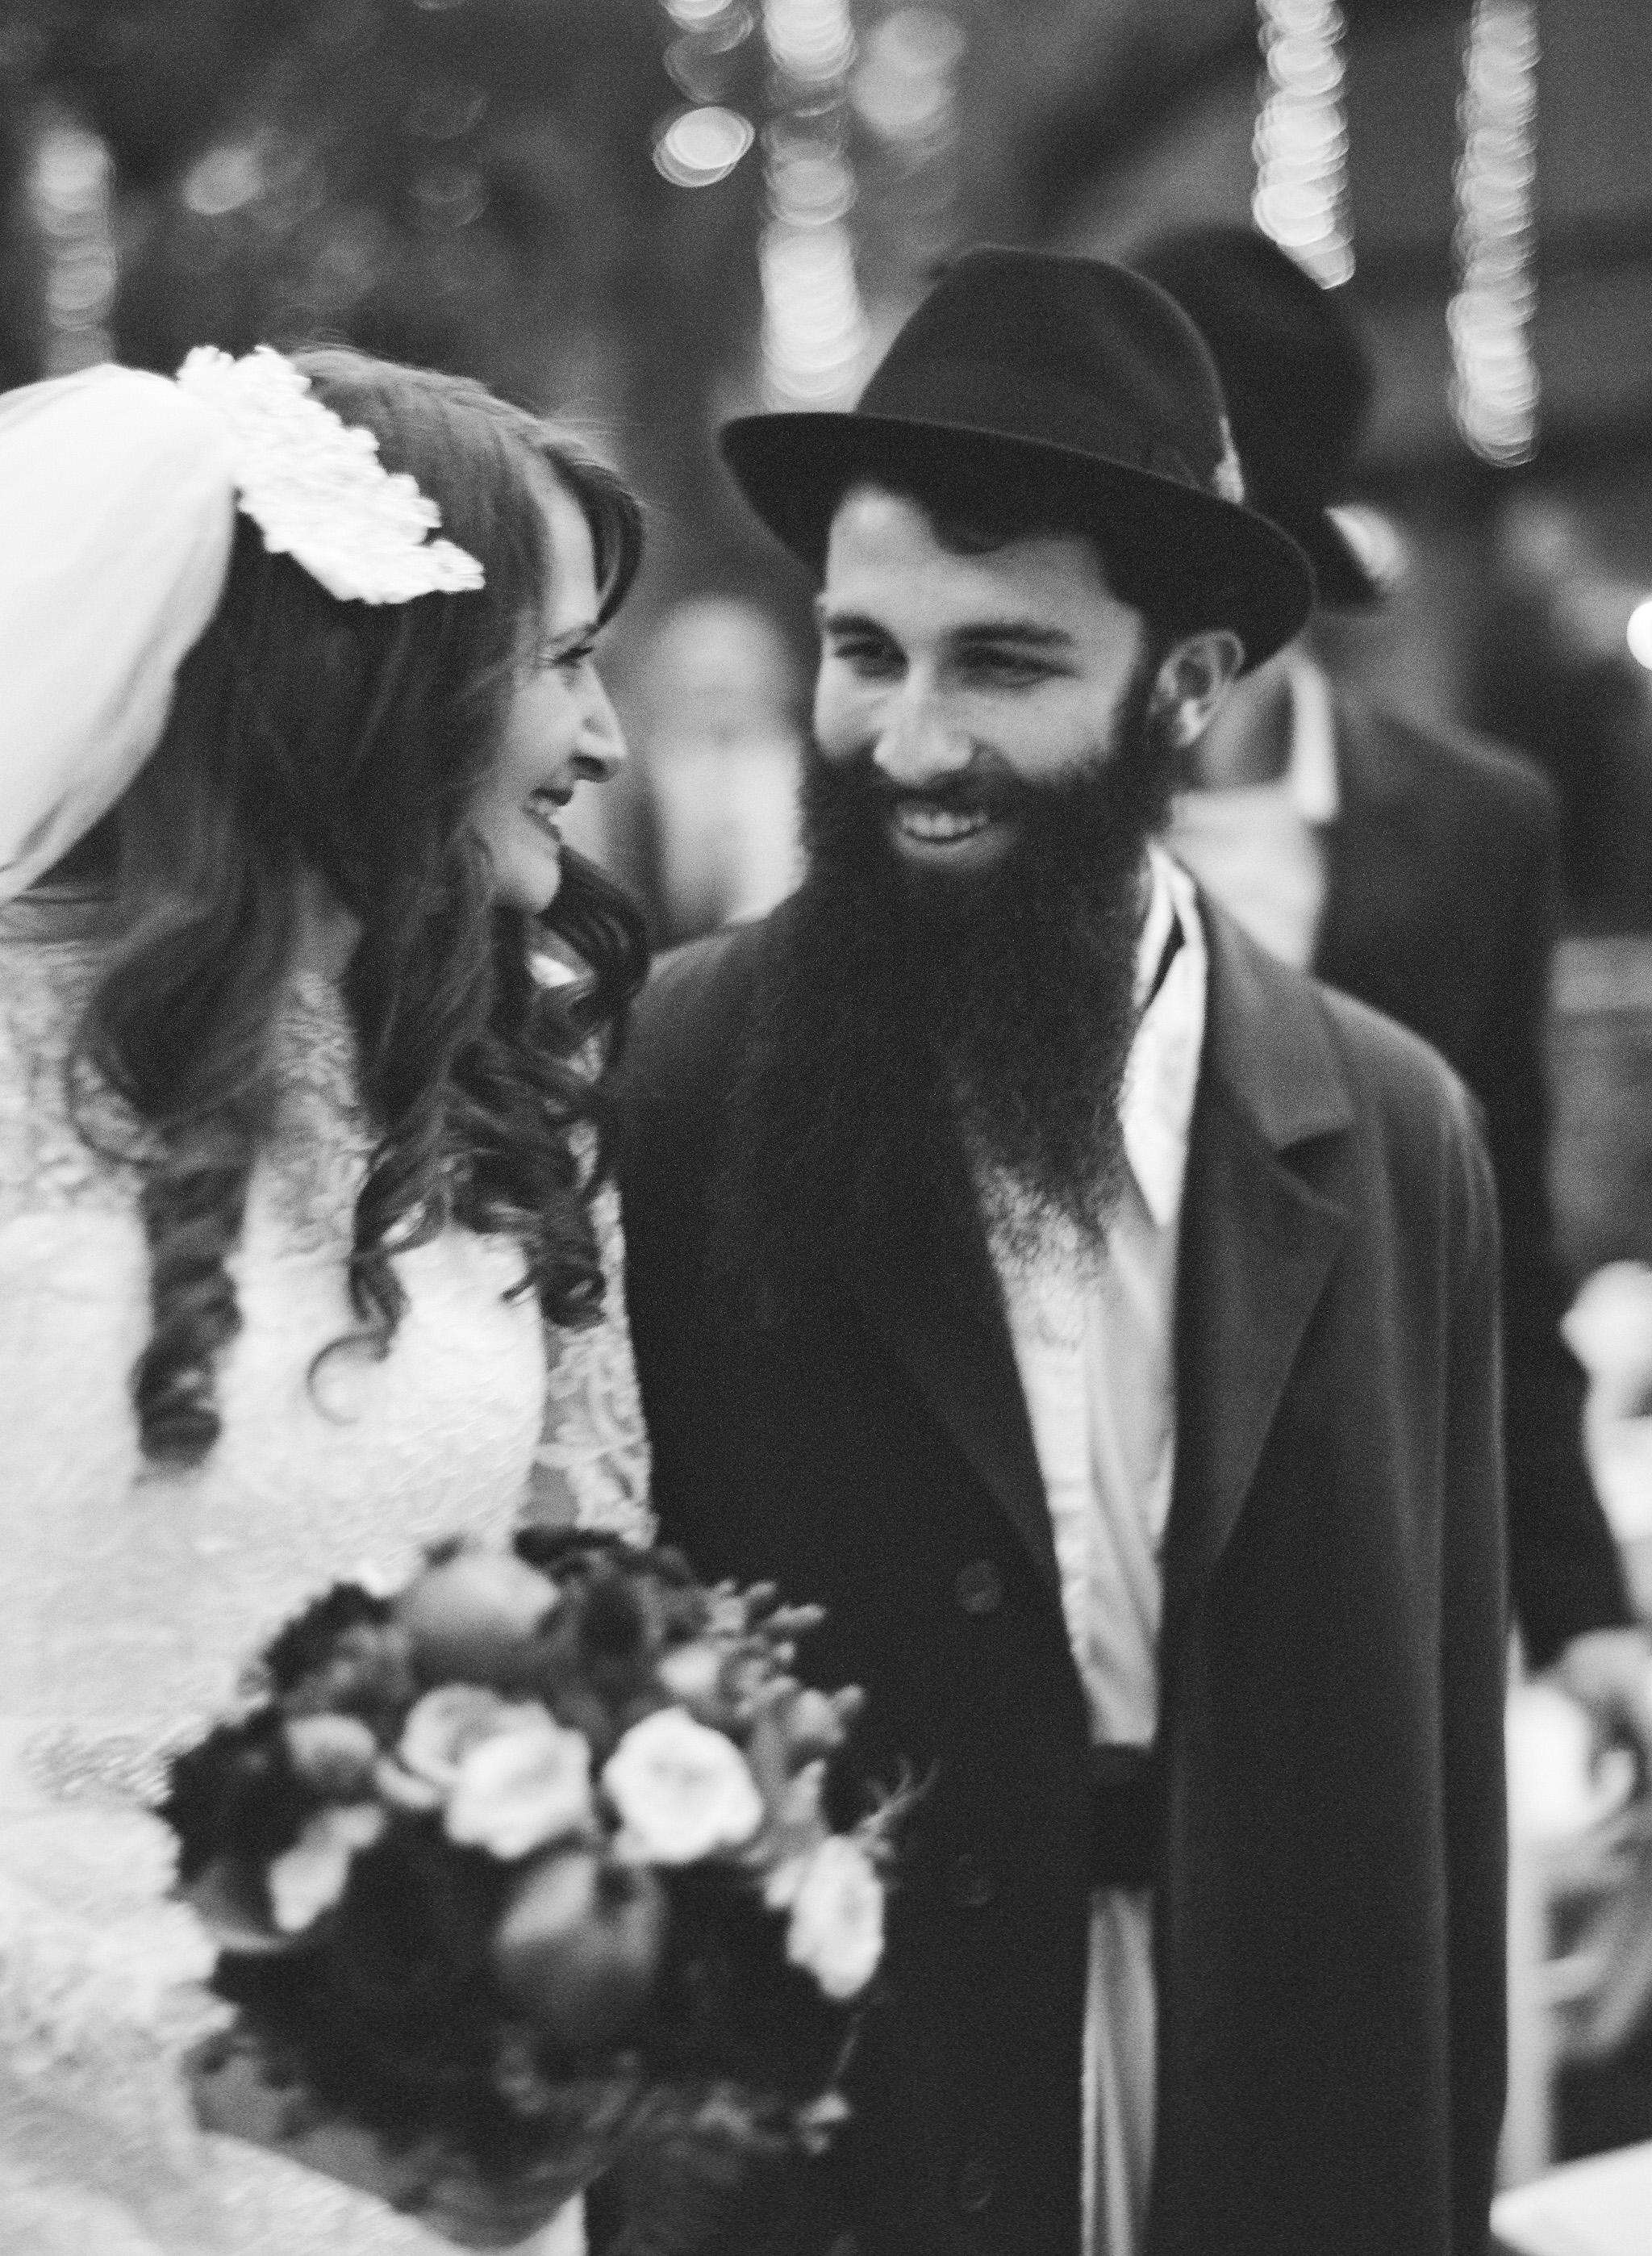 Top destination wedding photographer photographs Orthodox Jewish wedding at Calamigos Ranch California Wedding